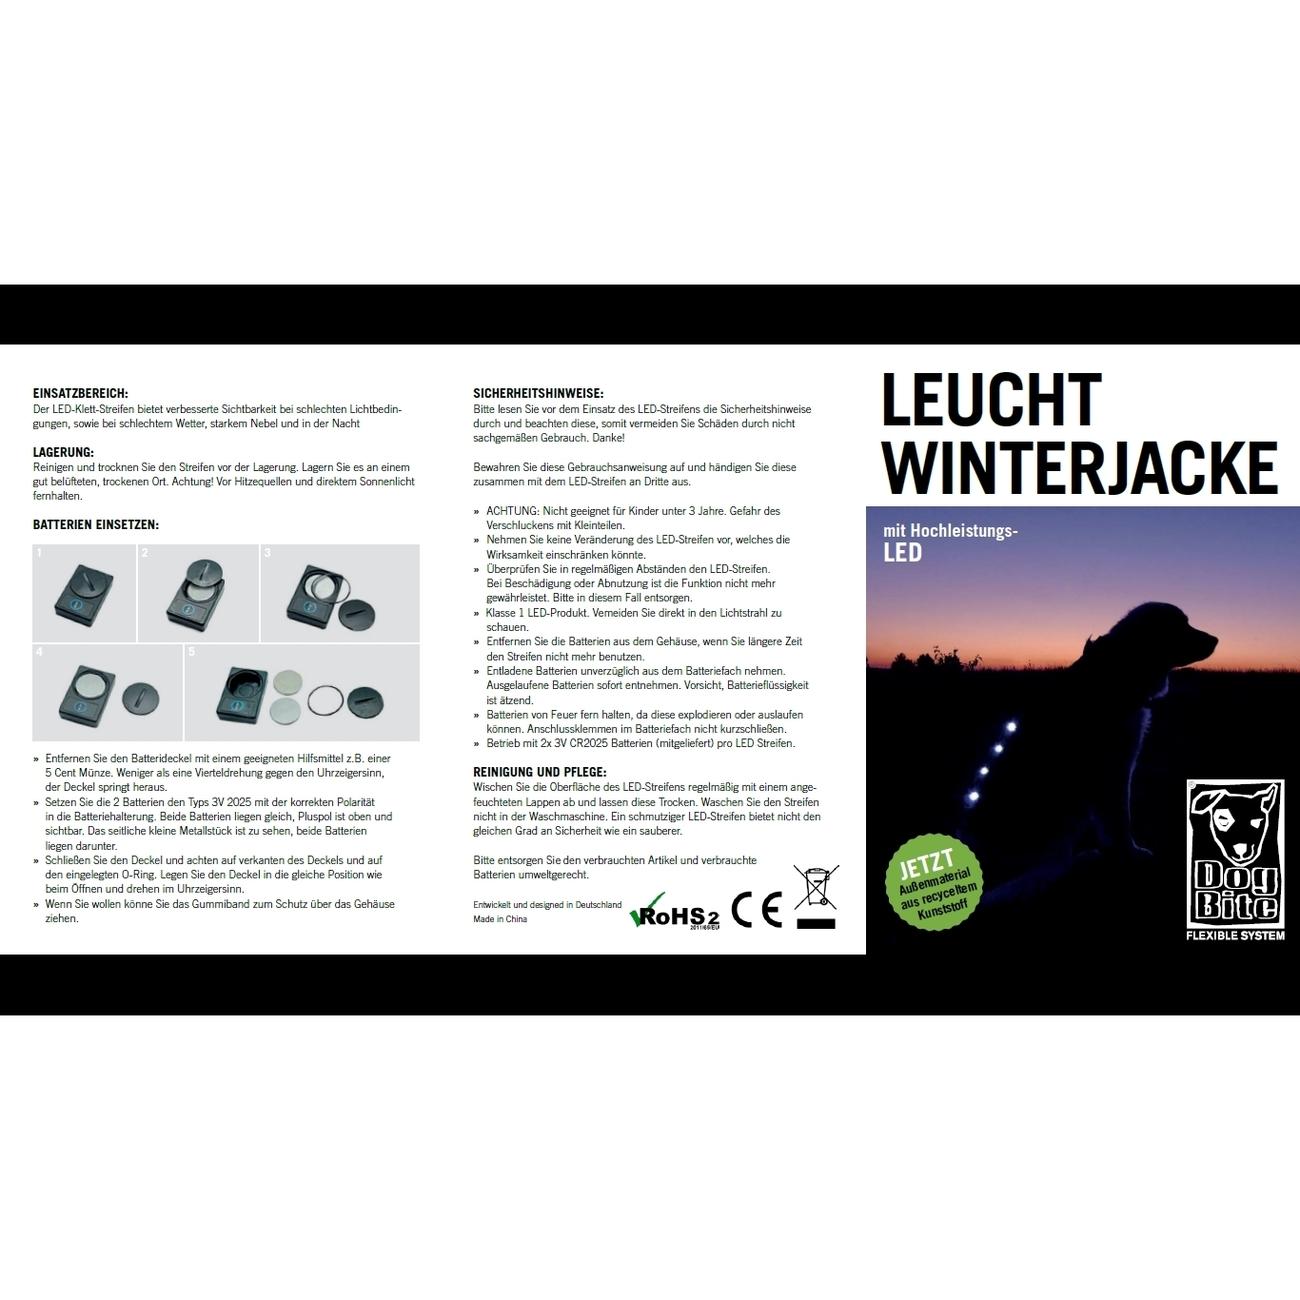 DogBite Hunde Leucht-Winterjacke mit LED, Bild 8